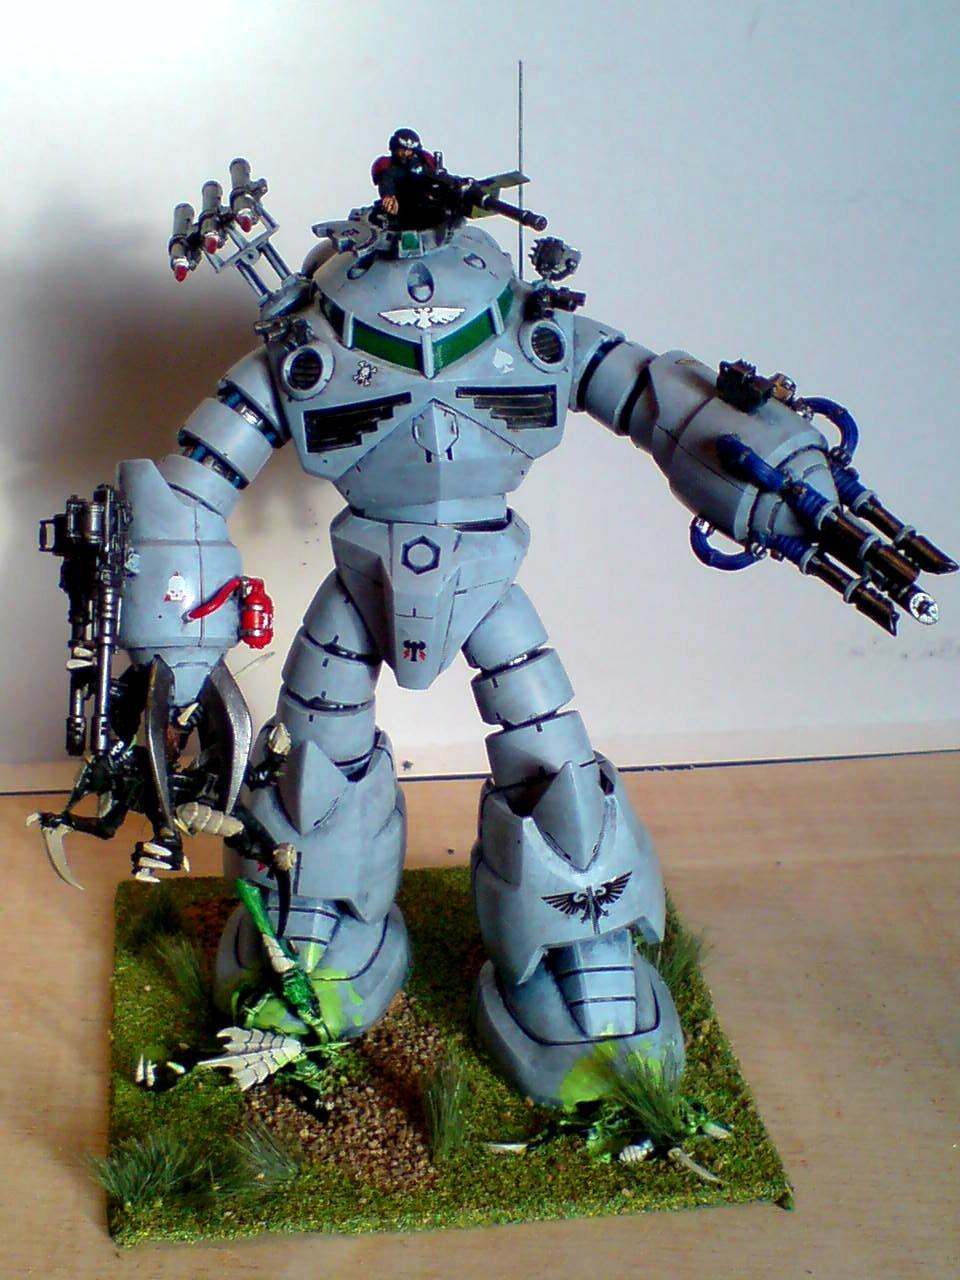 Anime, Conversion, Gundam, Imperial Guard, Mecha, Painted, Scouts, Titan, Warhammer 40,000